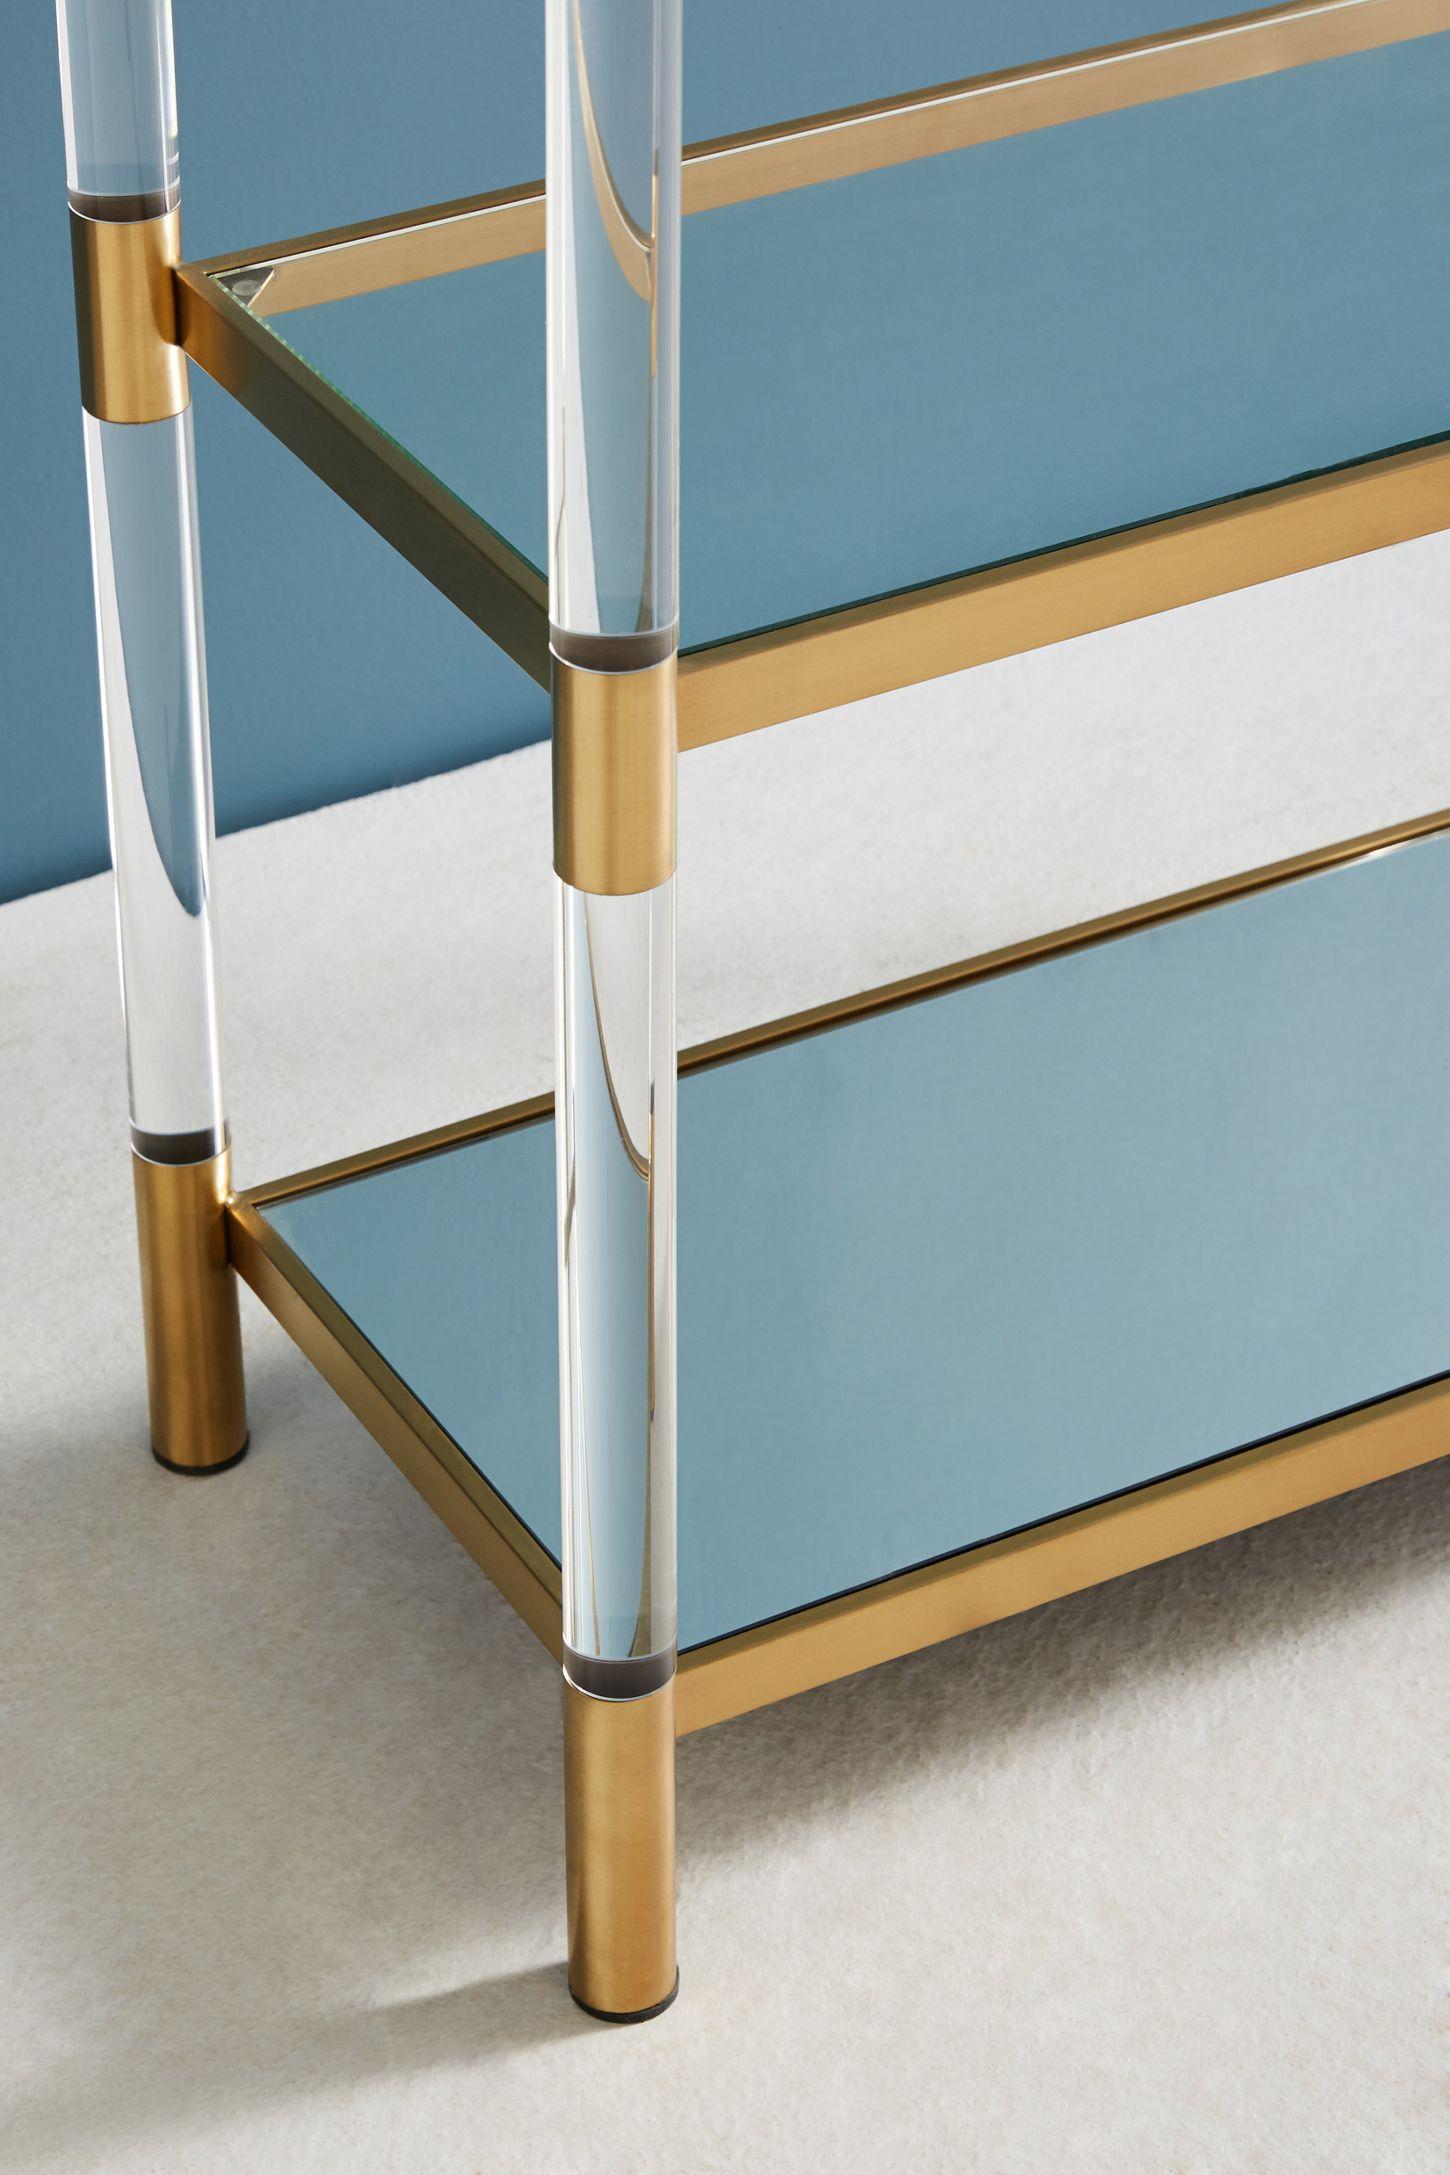 Slide View 3 Oscarine Lucite Mirrored Bookshelf